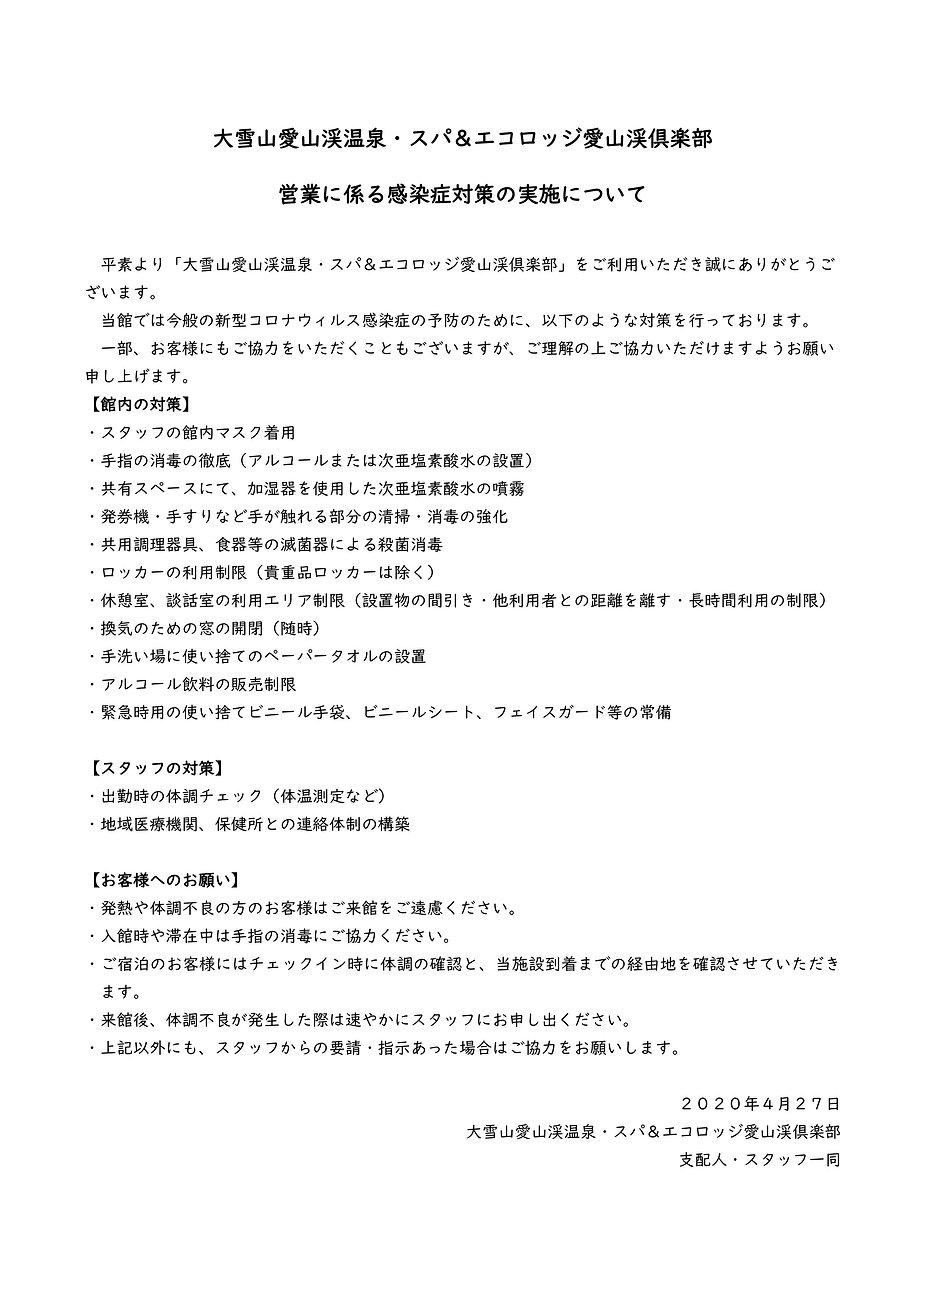 200424愛山渓倶楽部コロナ対策.jpg